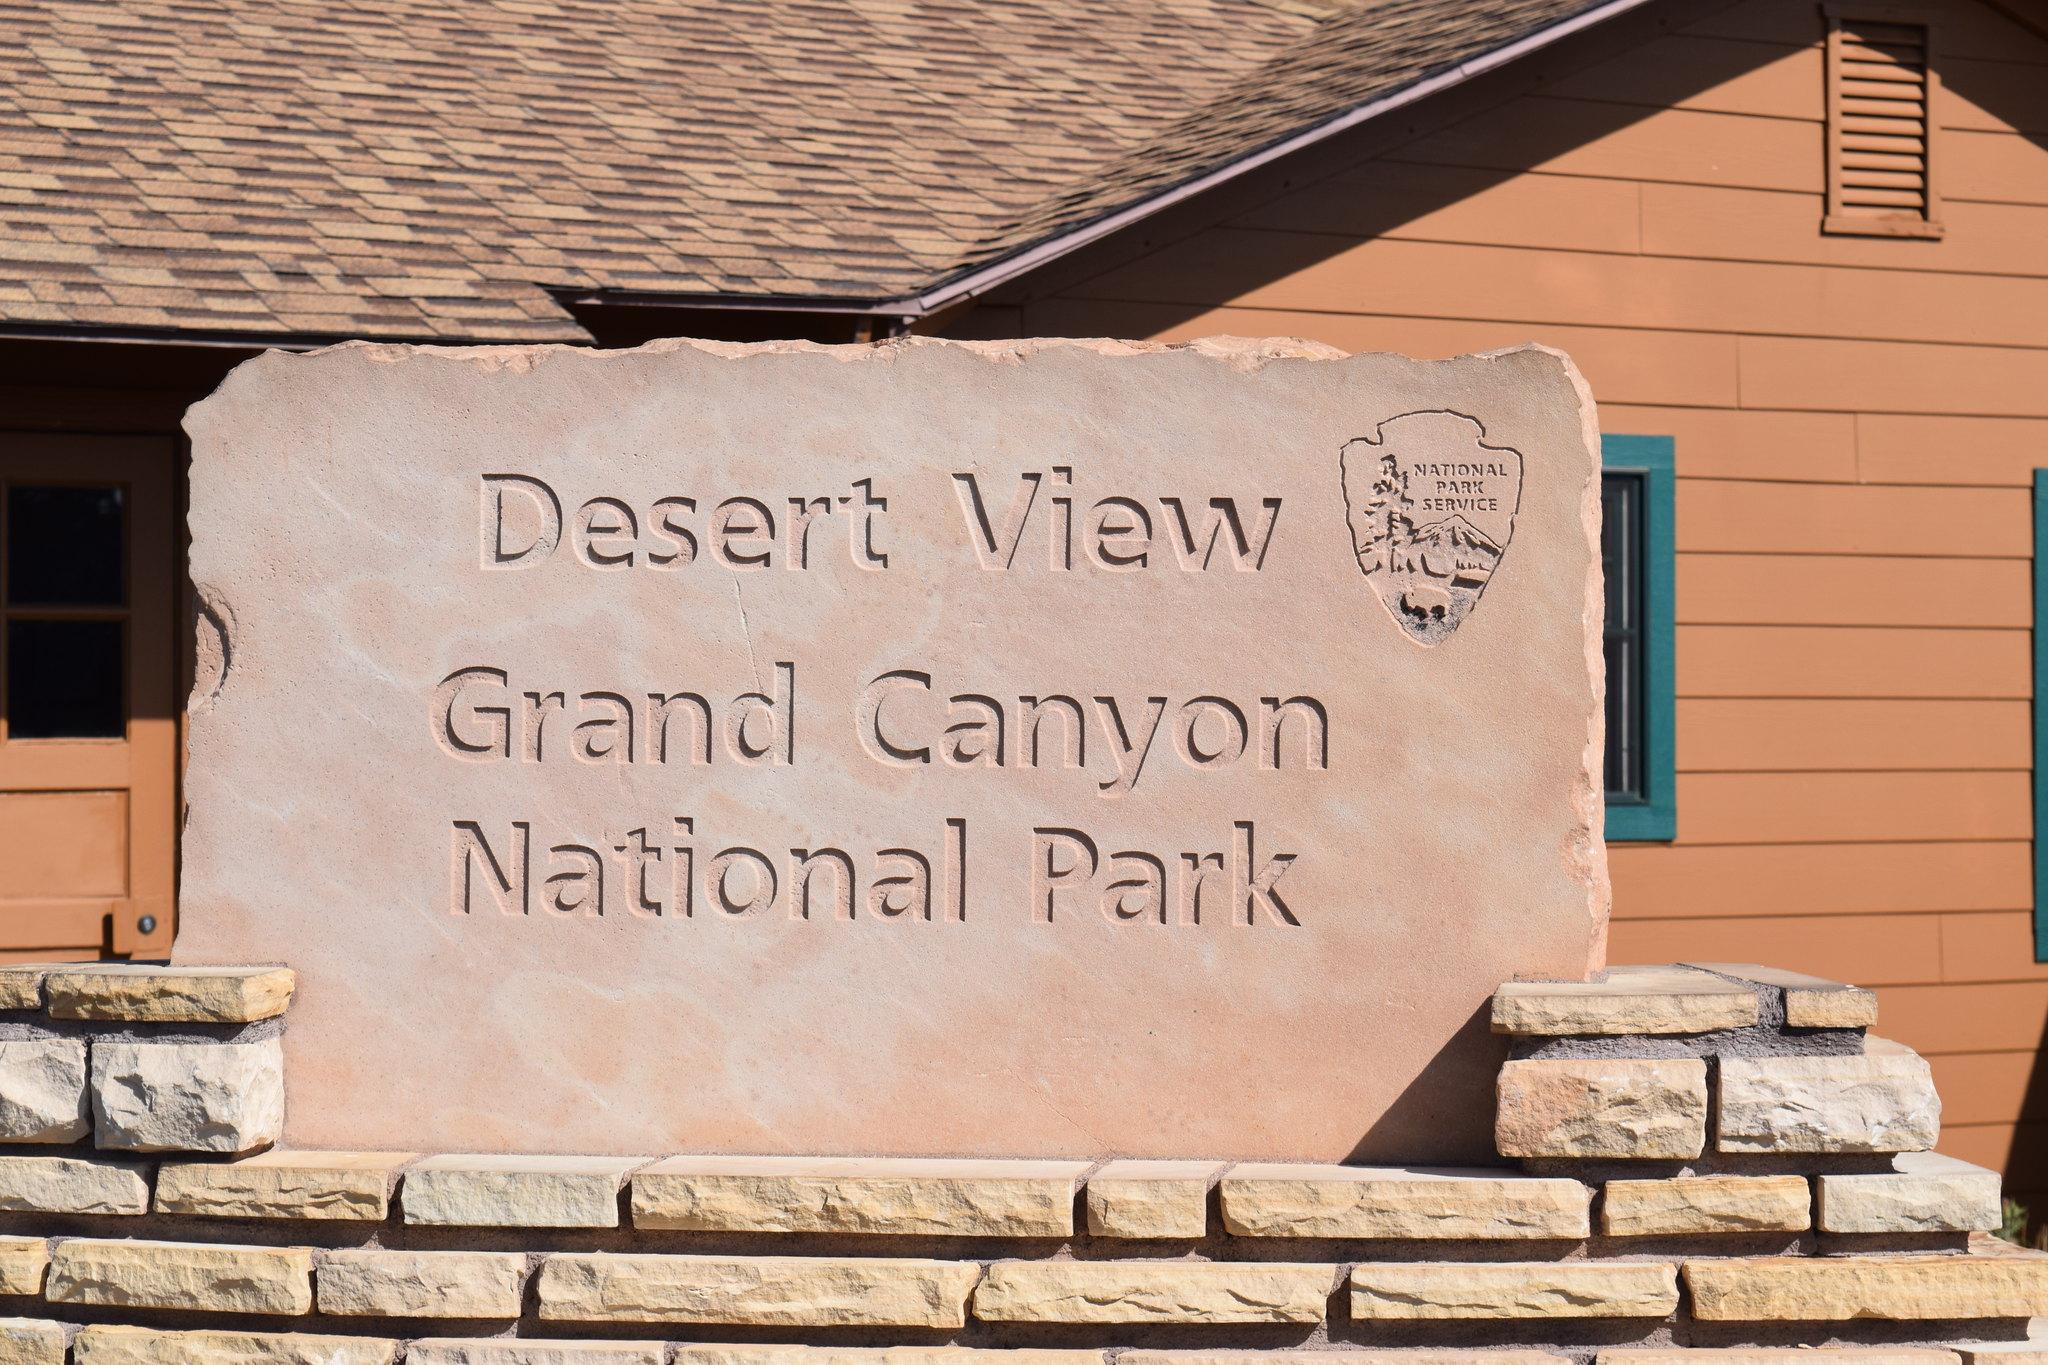 Desert View Grand Canyon National Park